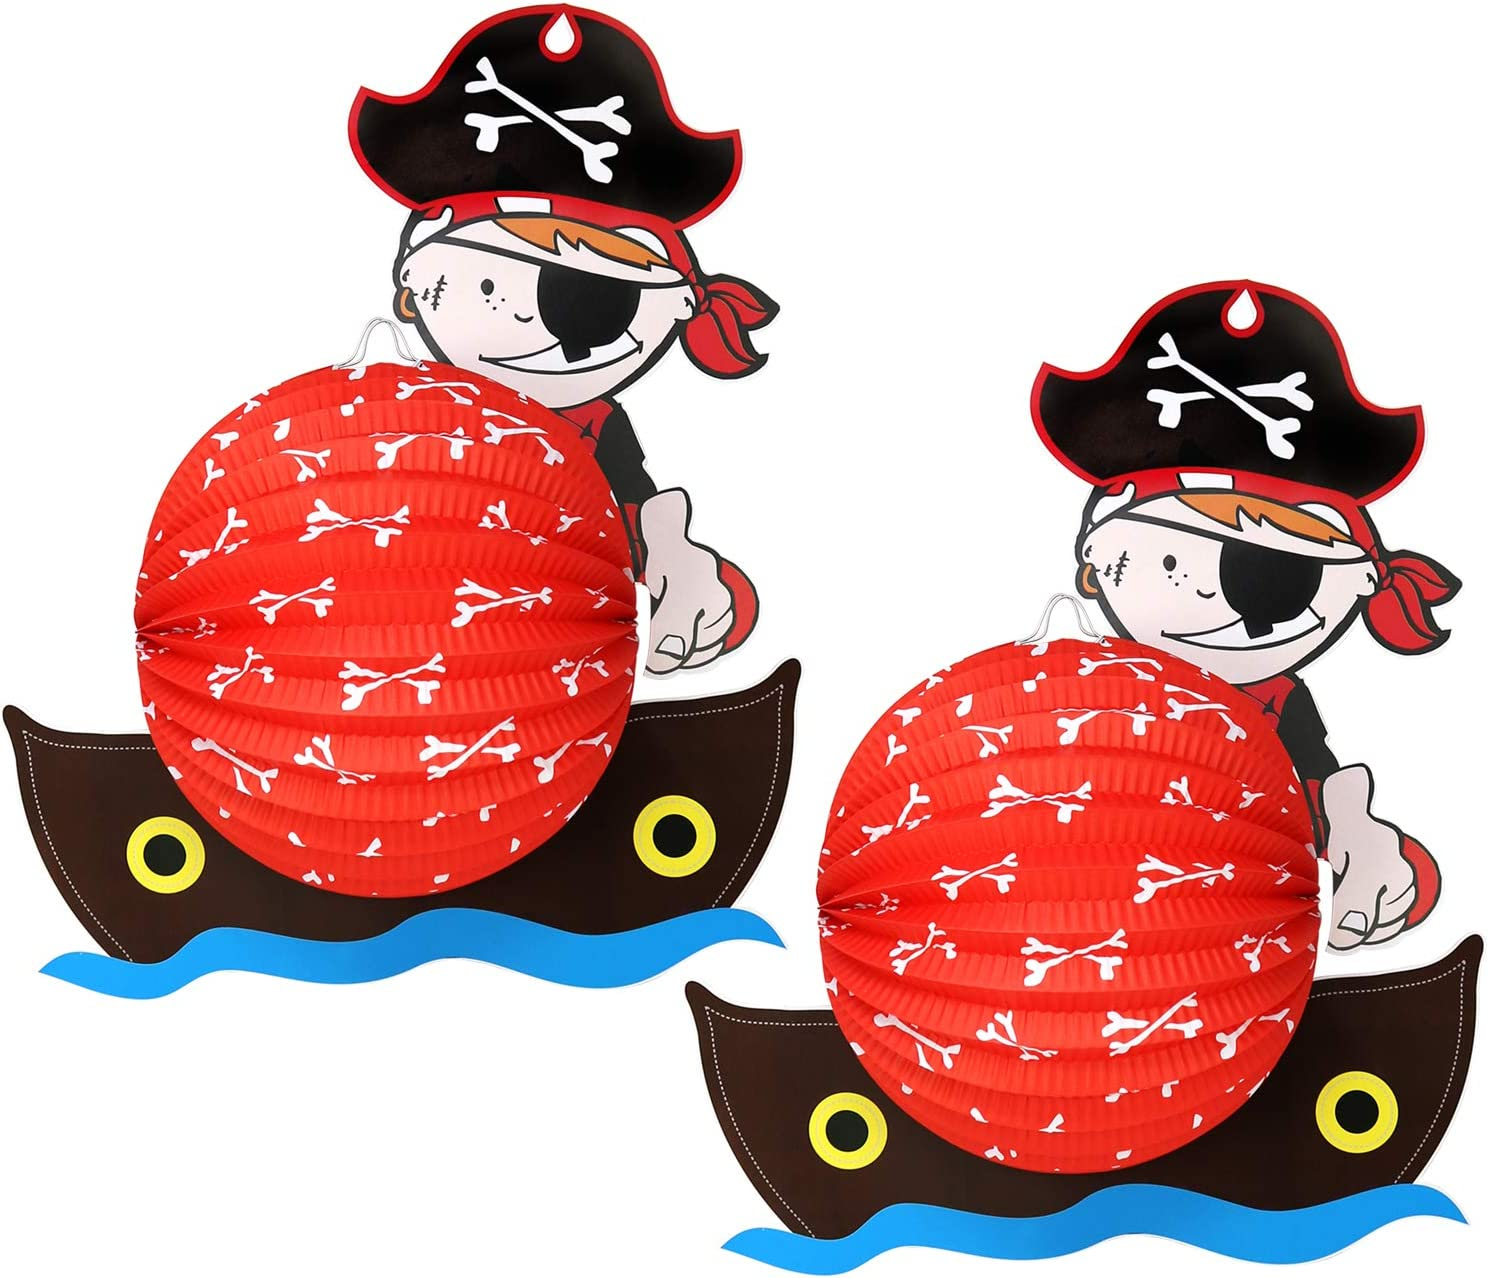 com-four/® 2X Laterne mit Buntem Pirat Motiv Martinslaterne f/ür Kinder Papierlaterne f/ür Sankt Martin und Halloween